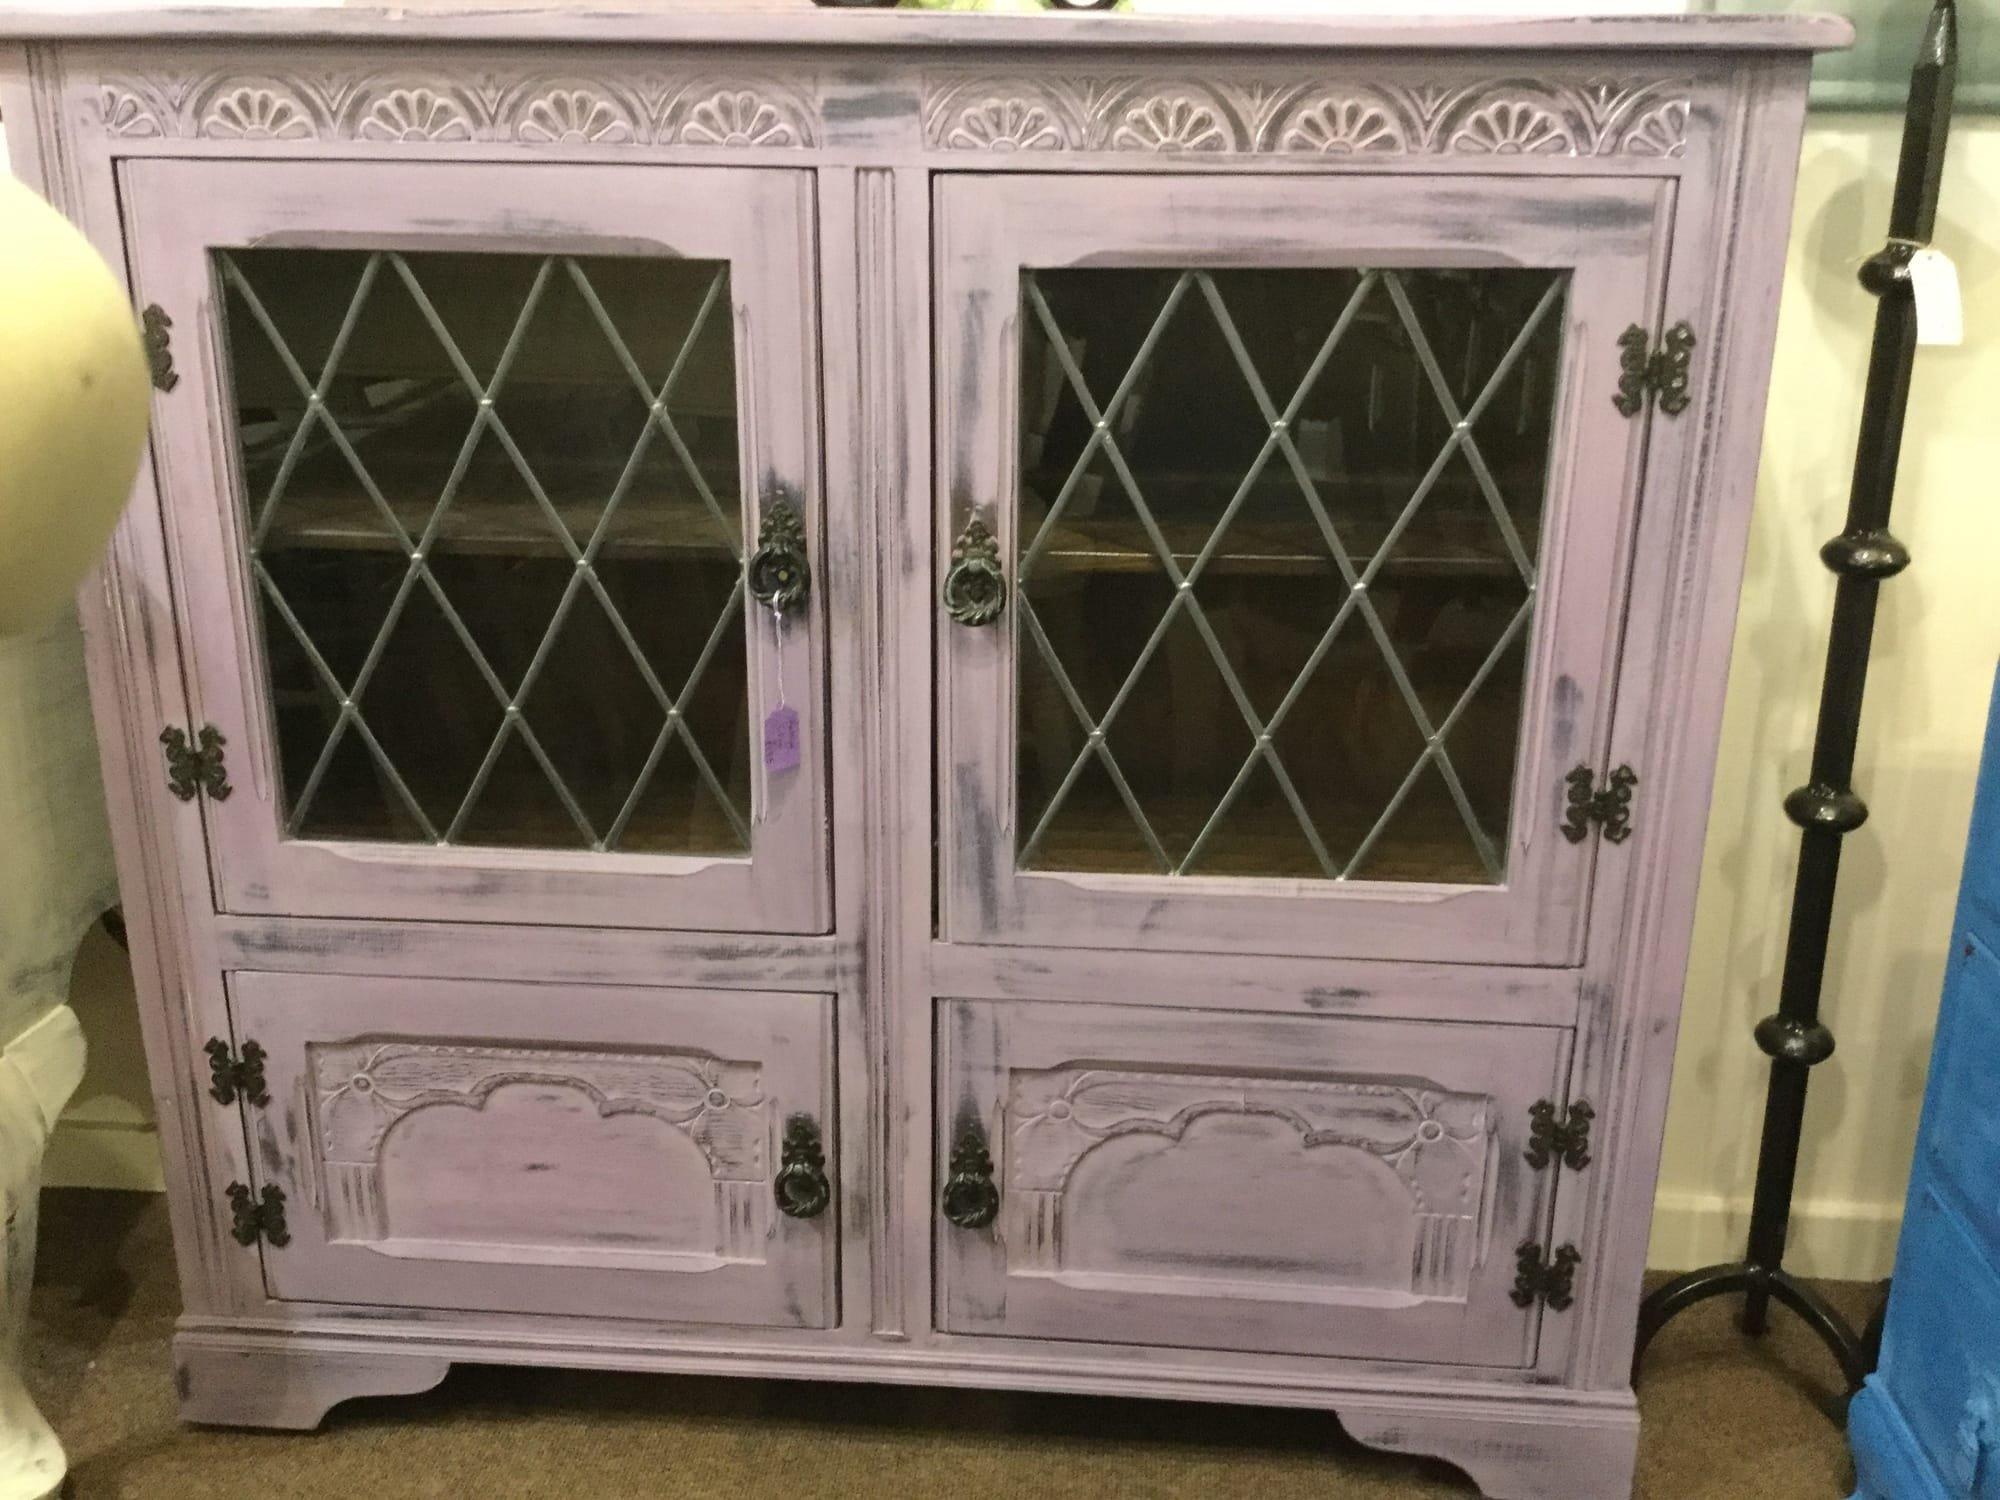 Emporium Melksham Quality Furniture Antiques Vintage  # Meuble Vintage Occasion